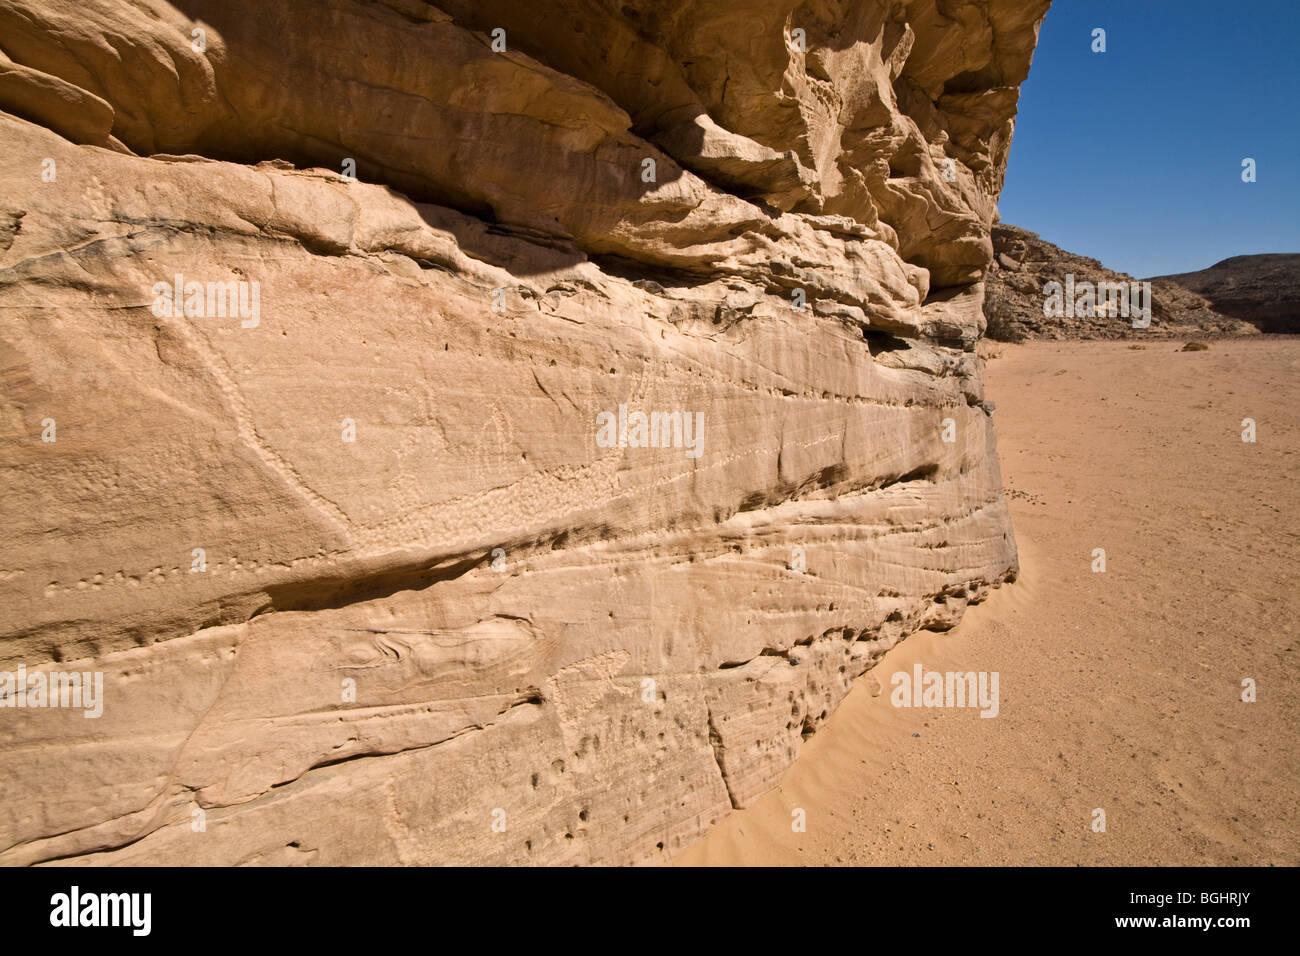 View along wadi floor showing rock-Art  in the Eastern Desert of Egypt. - Stock Image